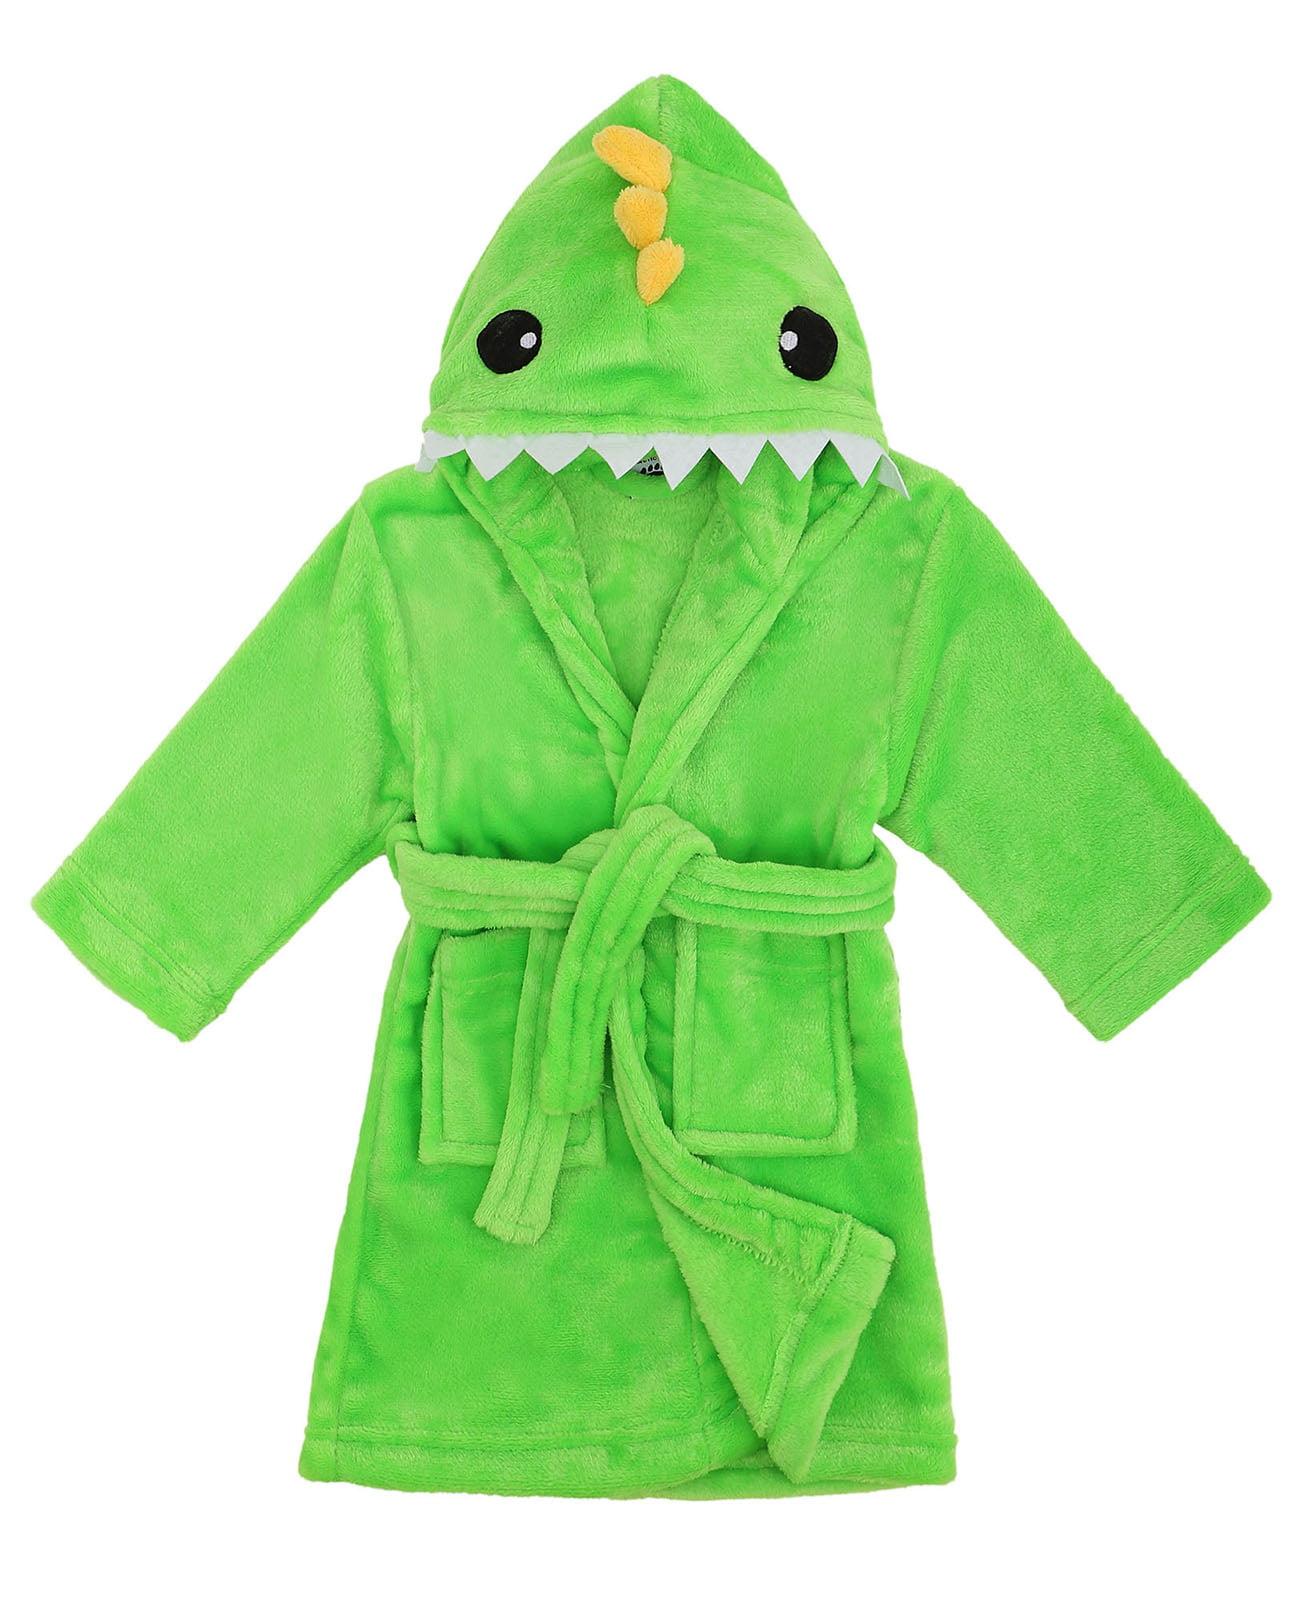 Boys Girls Plush Animal Hooded Bath Robe Pajamas Bathrobe Nightgown Sleepwear